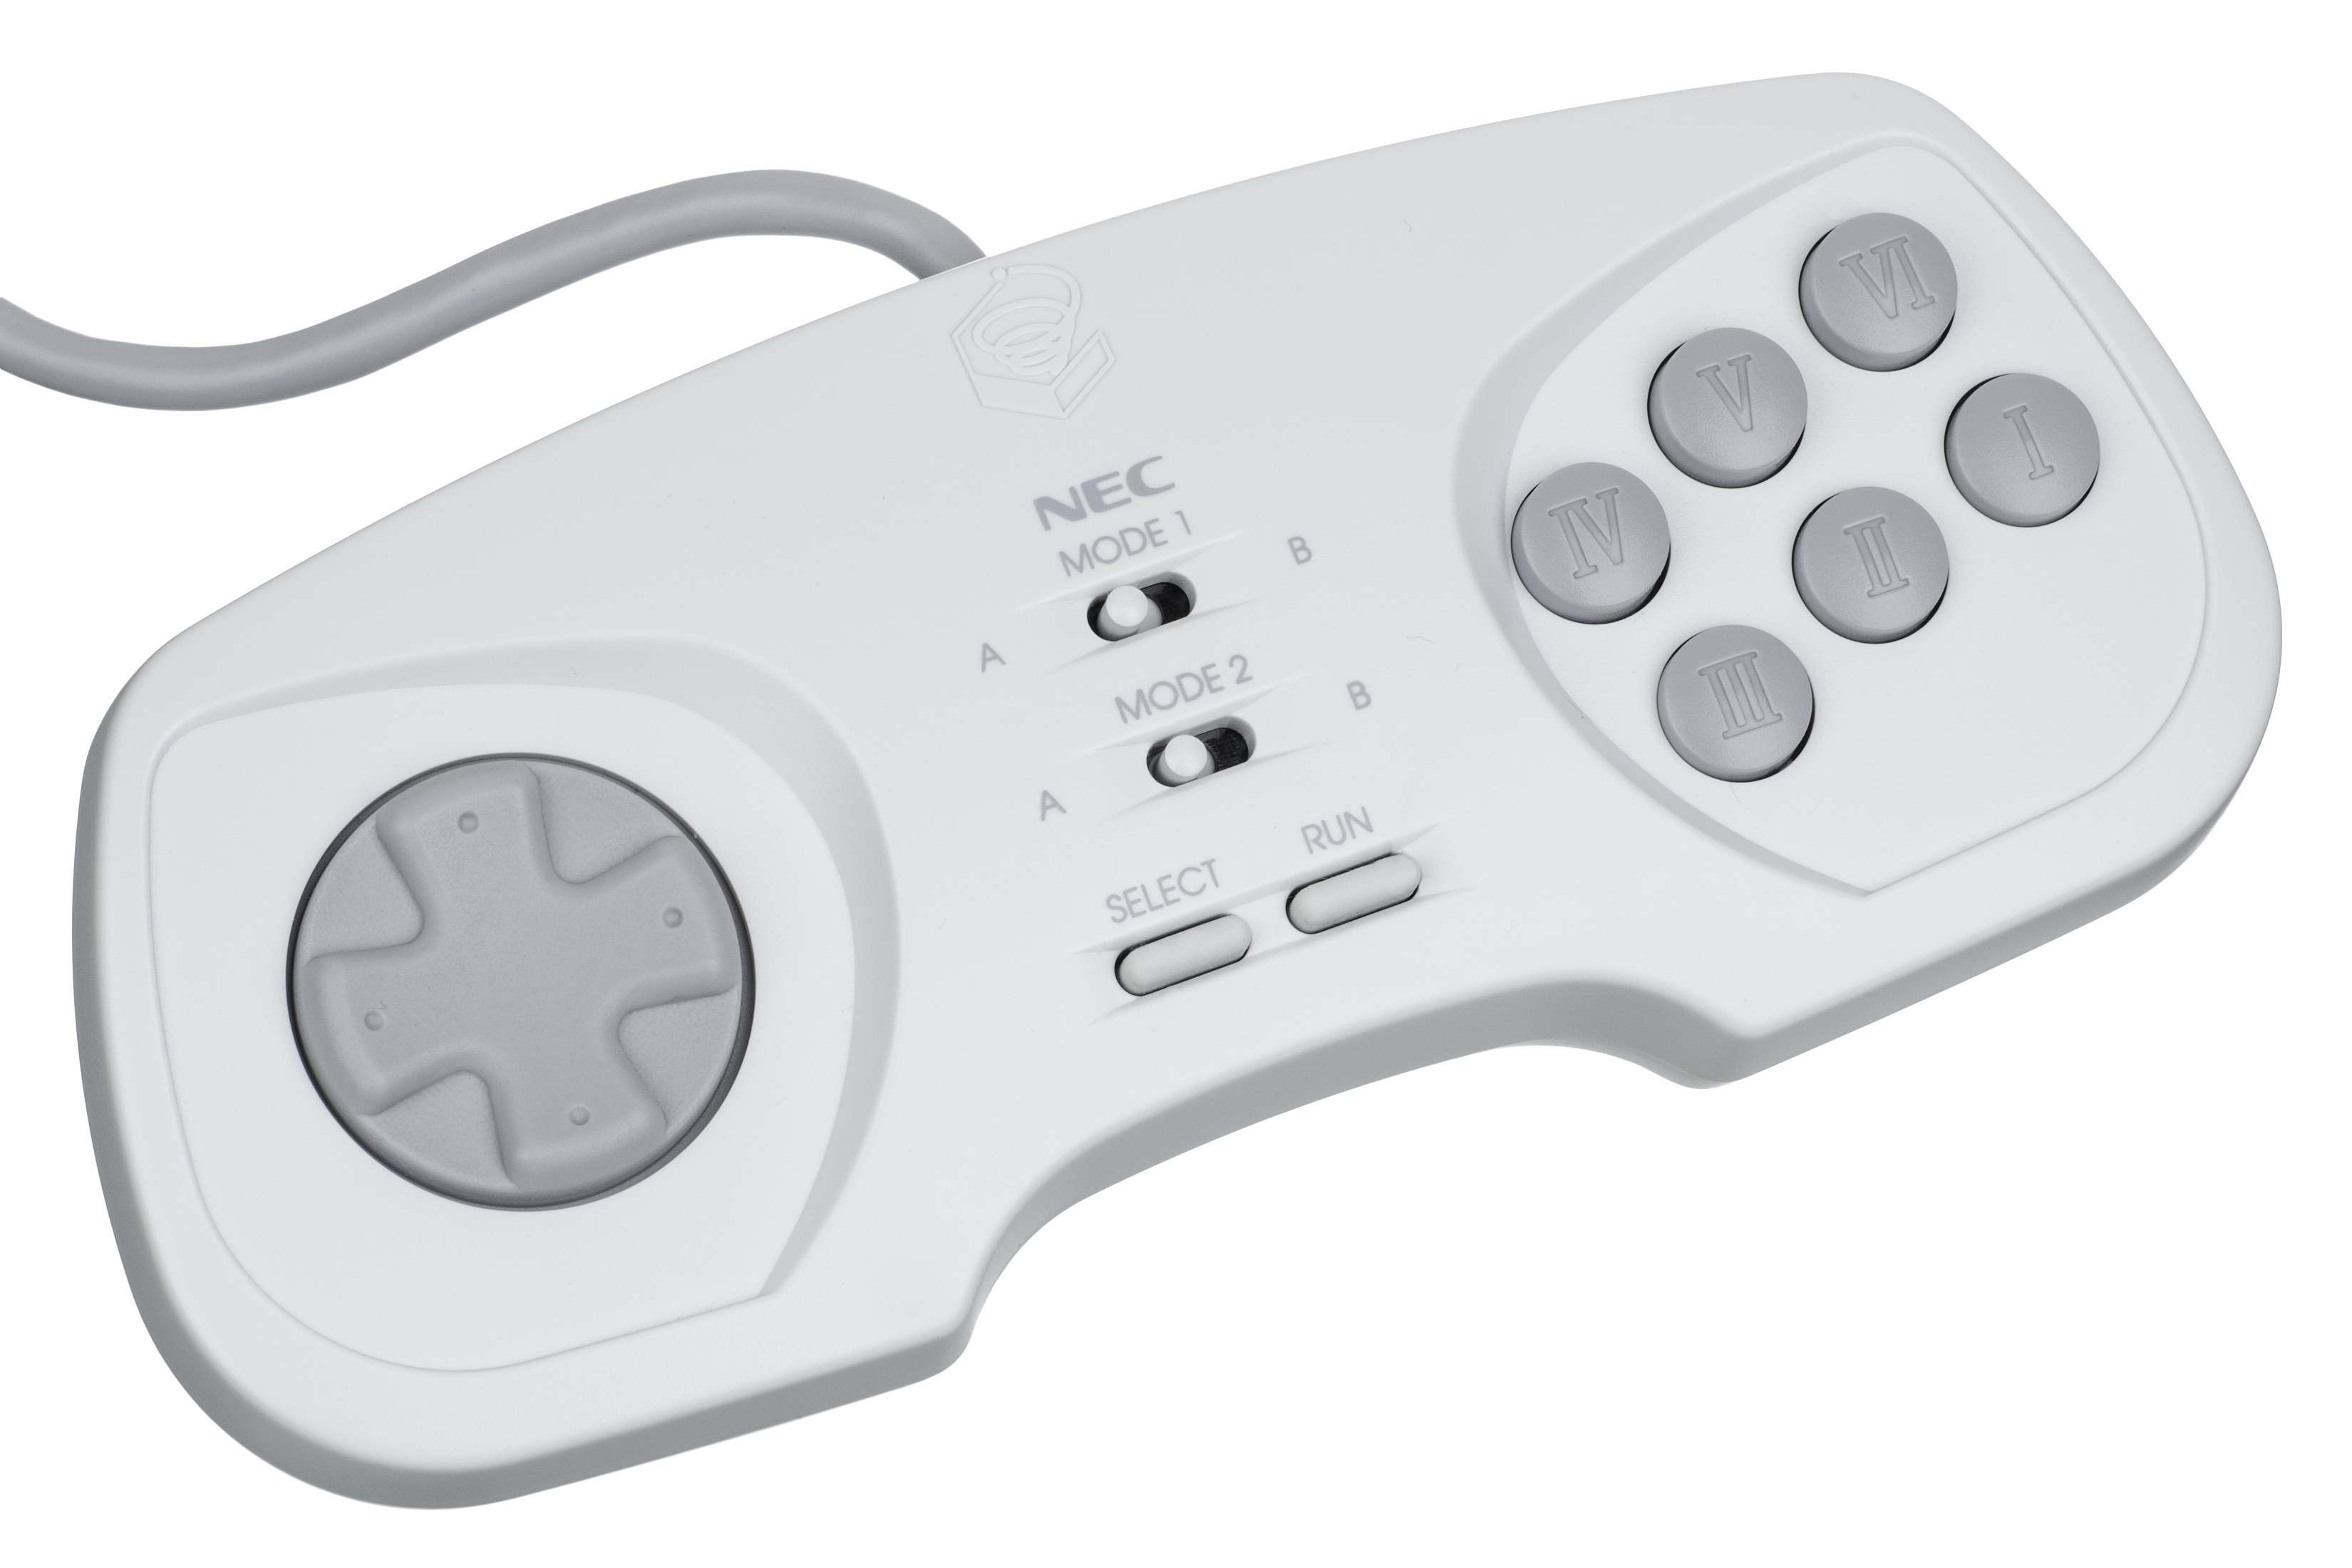 NEC-PC-FX-Controller-FR.jpg